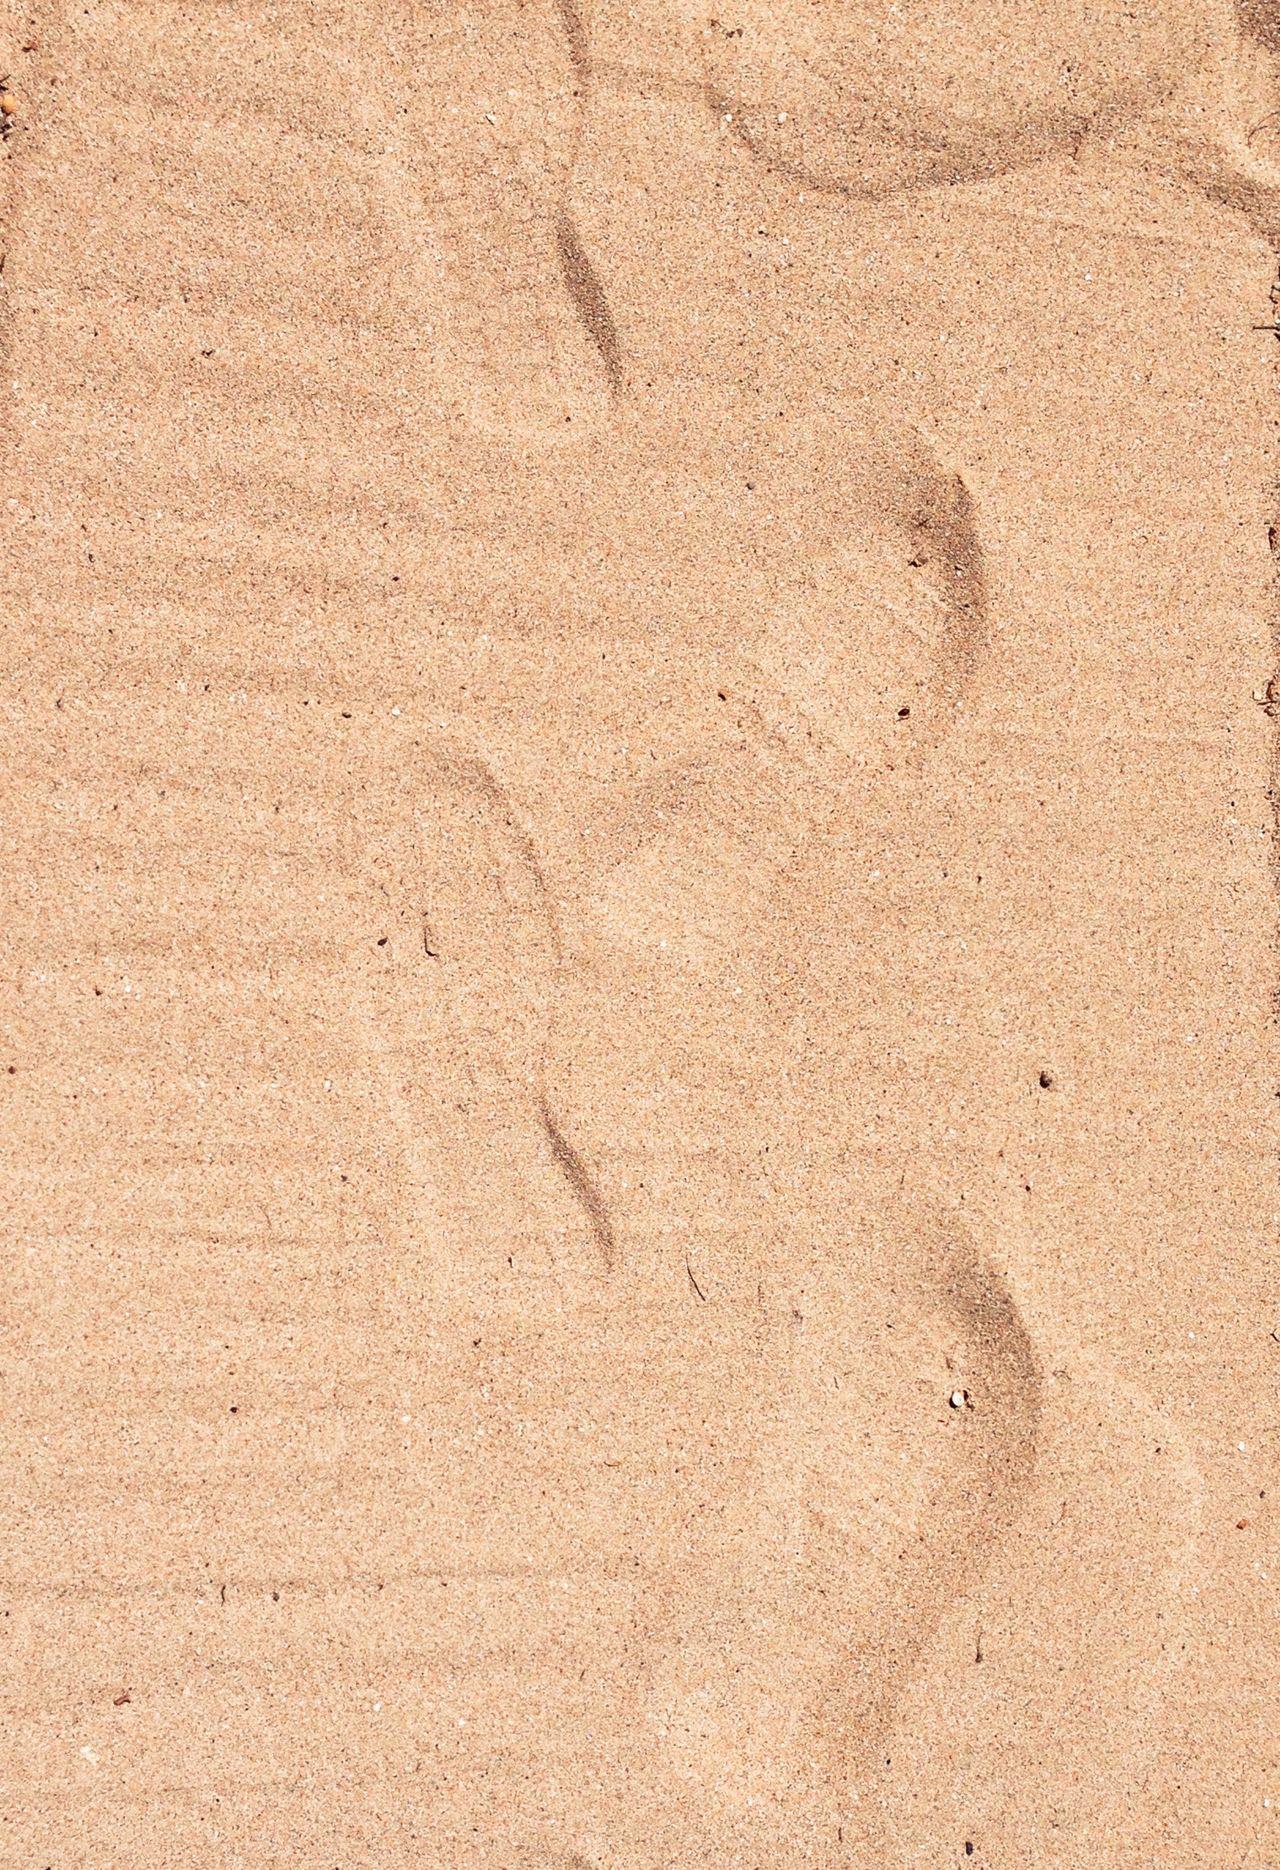 Spiaggia Mare Sabbia Giallo Orme Impronte Sand Beach Footsteps